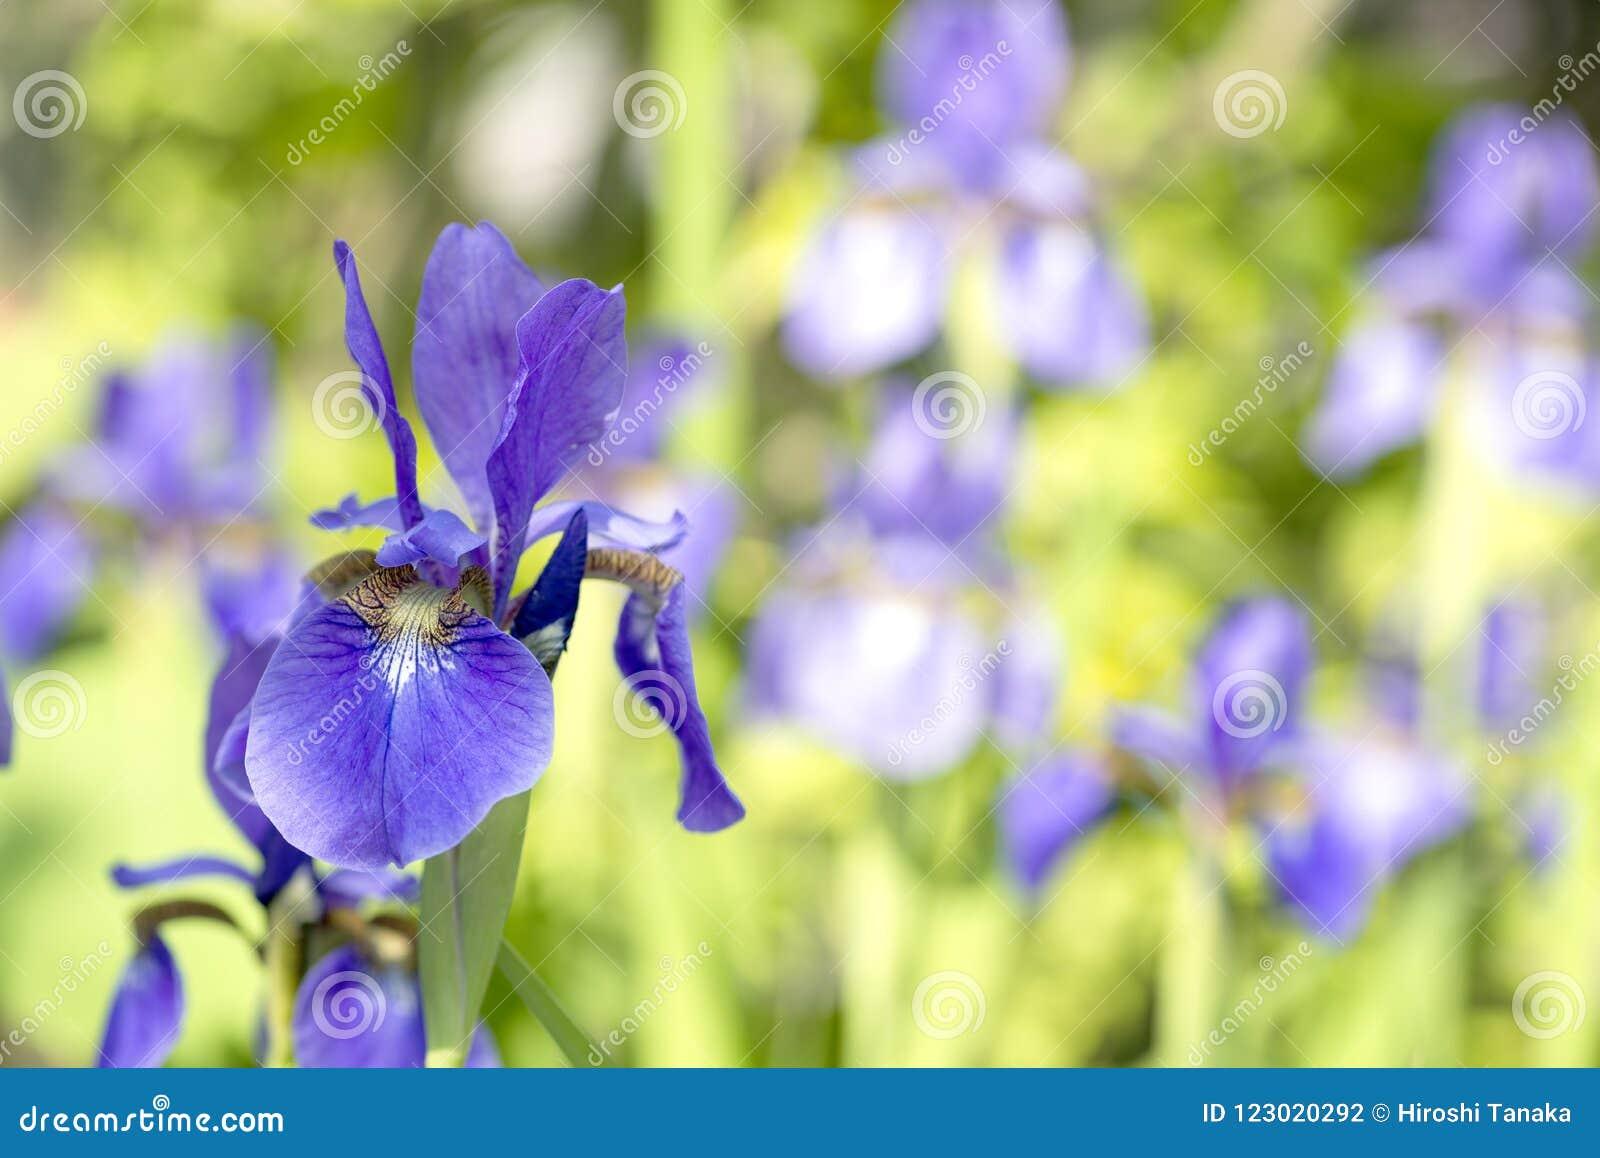 Purple siberian iris flower stock photo image of nature gardening download purple siberian iris flower stock photo image of nature gardening 123020292 izmirmasajfo